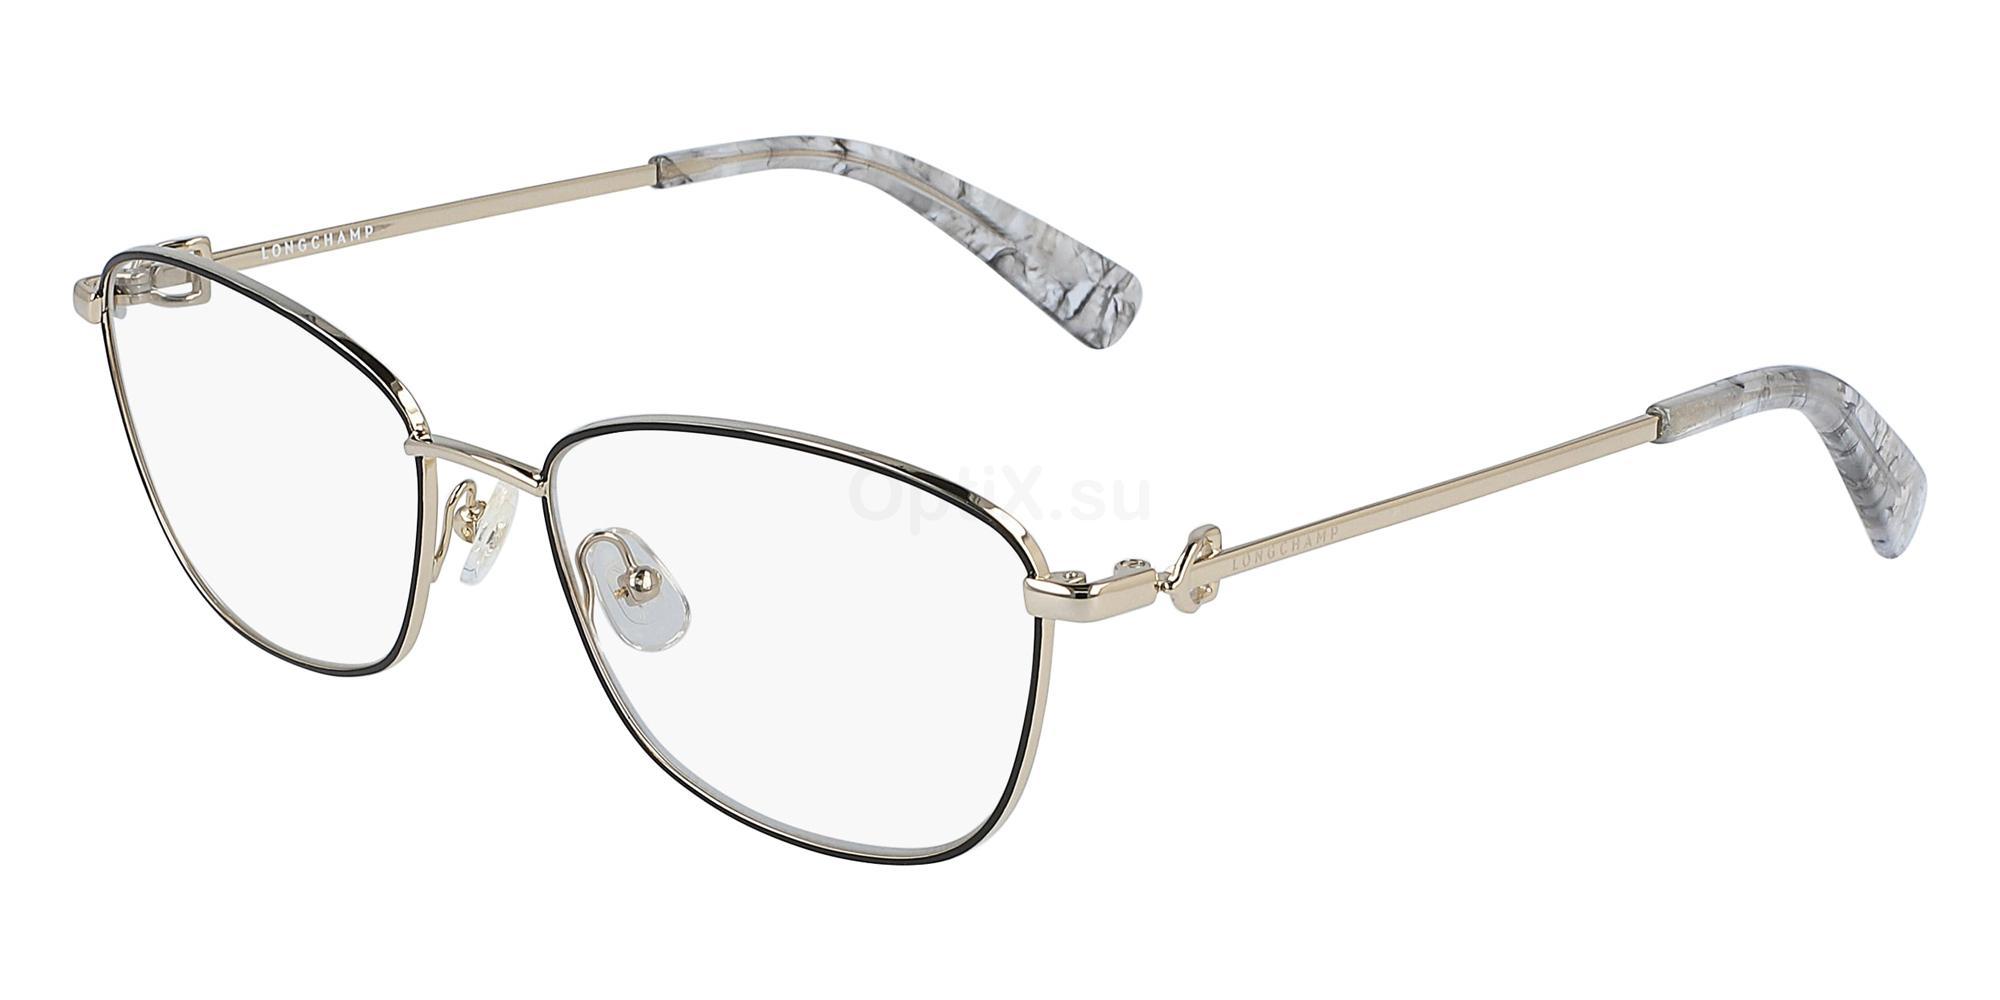 001 LO2128 Glasses, LONGCHAMP